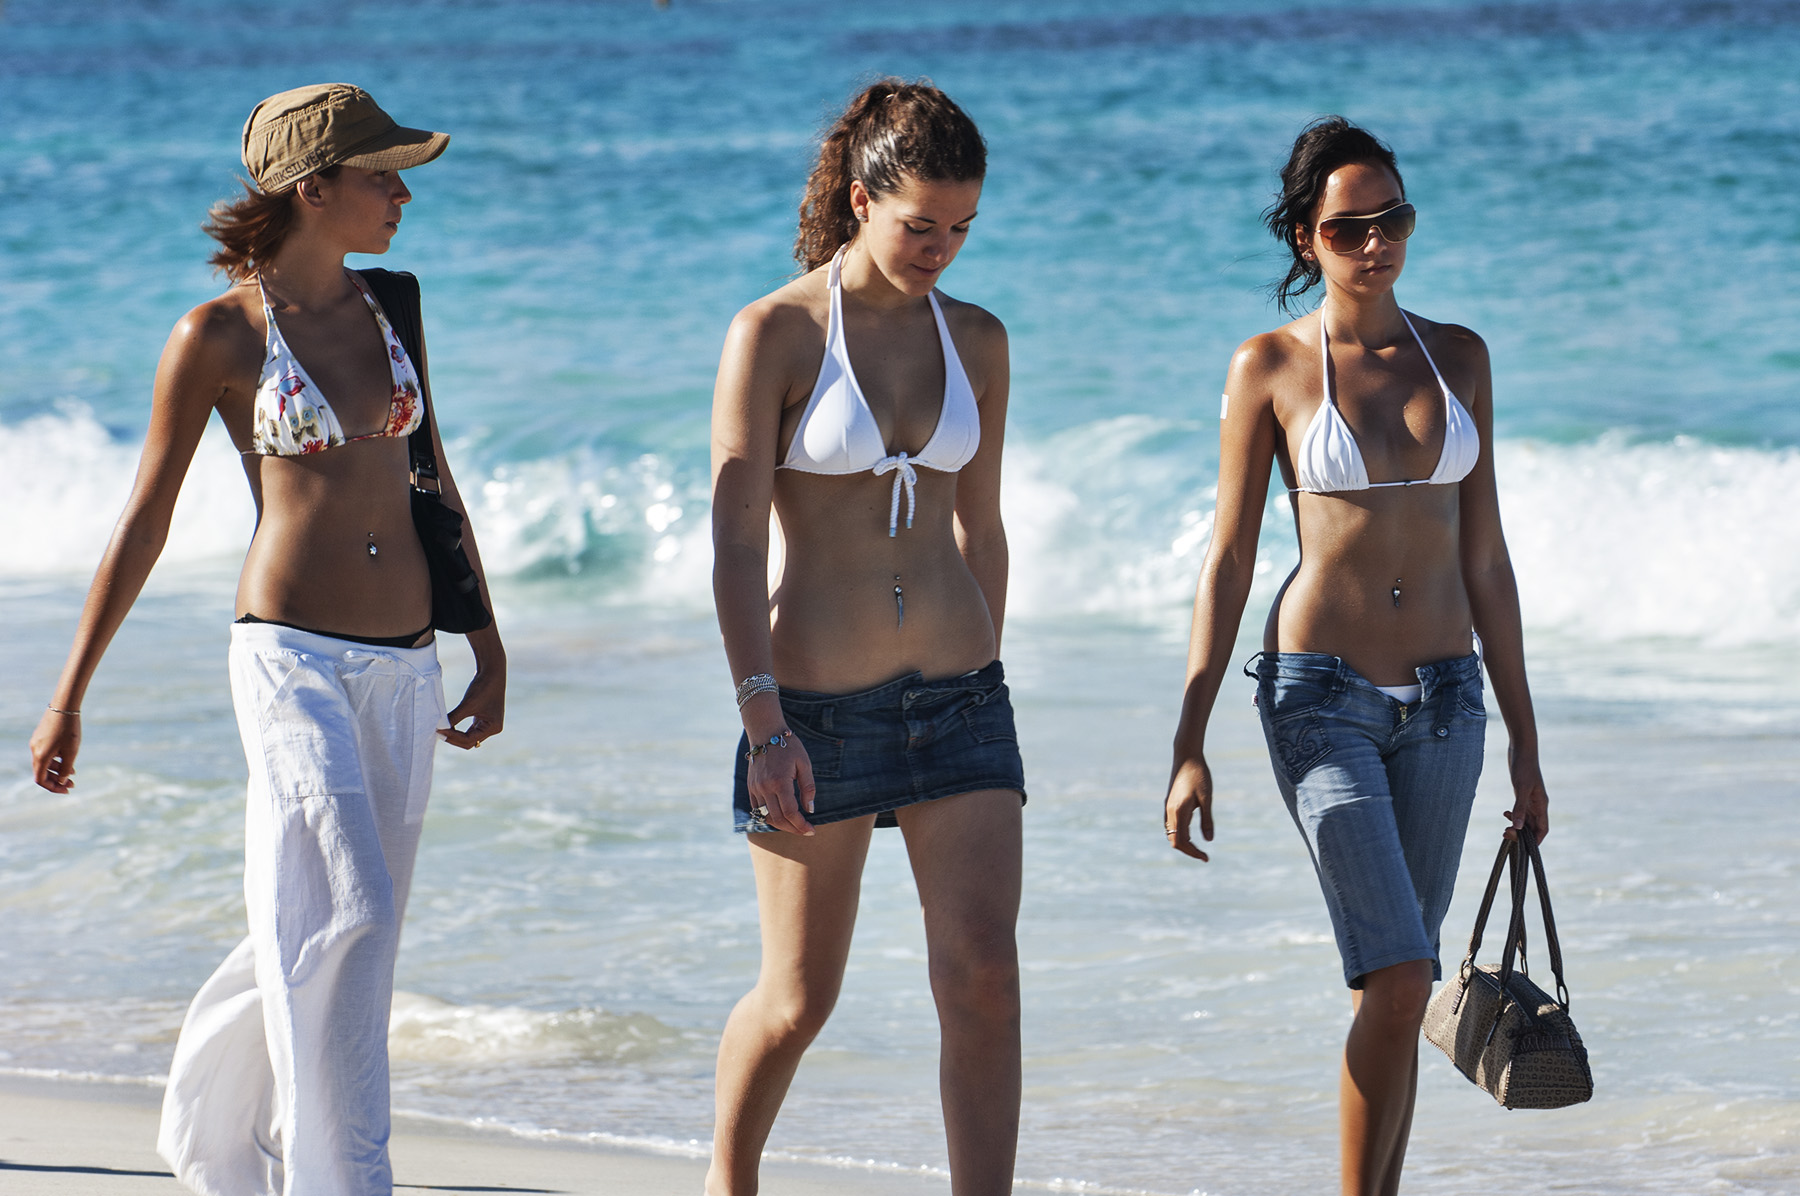 st-martin_orient-beach_three-girls_